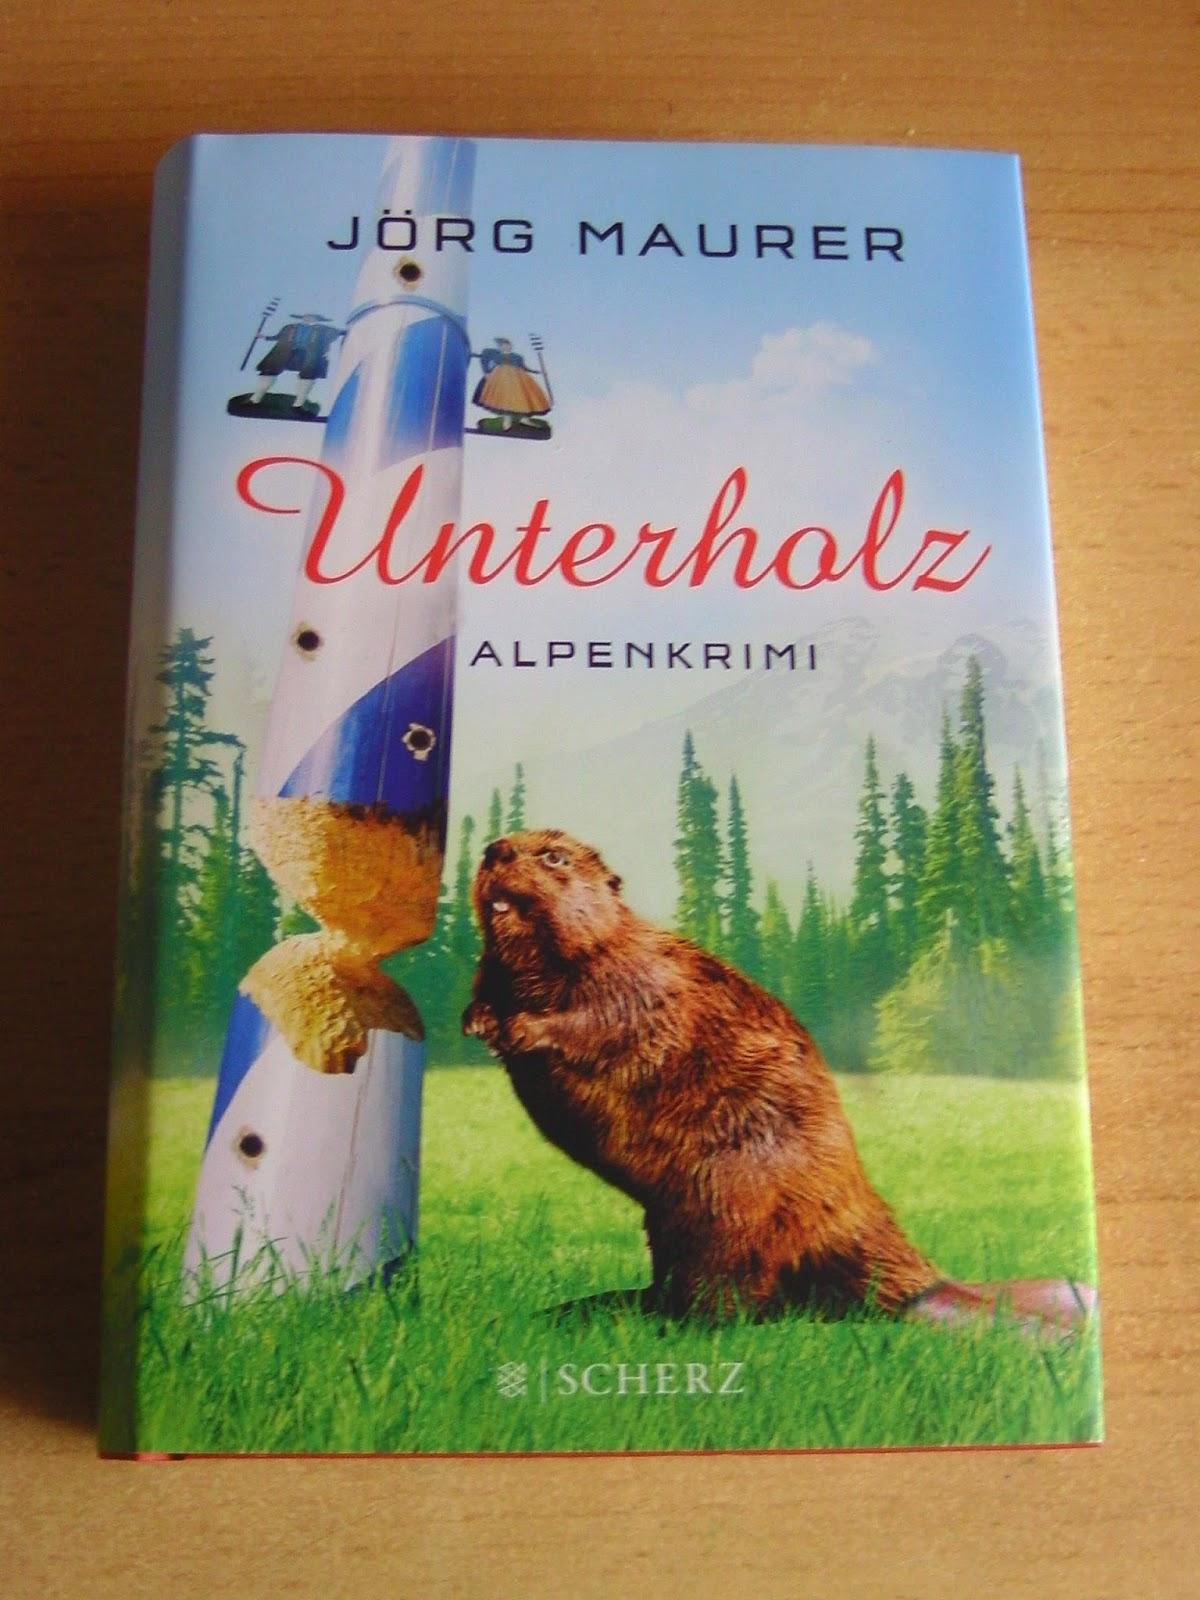 http://www.amazon.de/Unterholz-Alpenkrimi-J%C3%B6rg-Maurer/dp/3596195357/ref=sr_1_1?s=books&ie=UTF8&qid=1424039694&sr=1-1&keywords=Unterholz